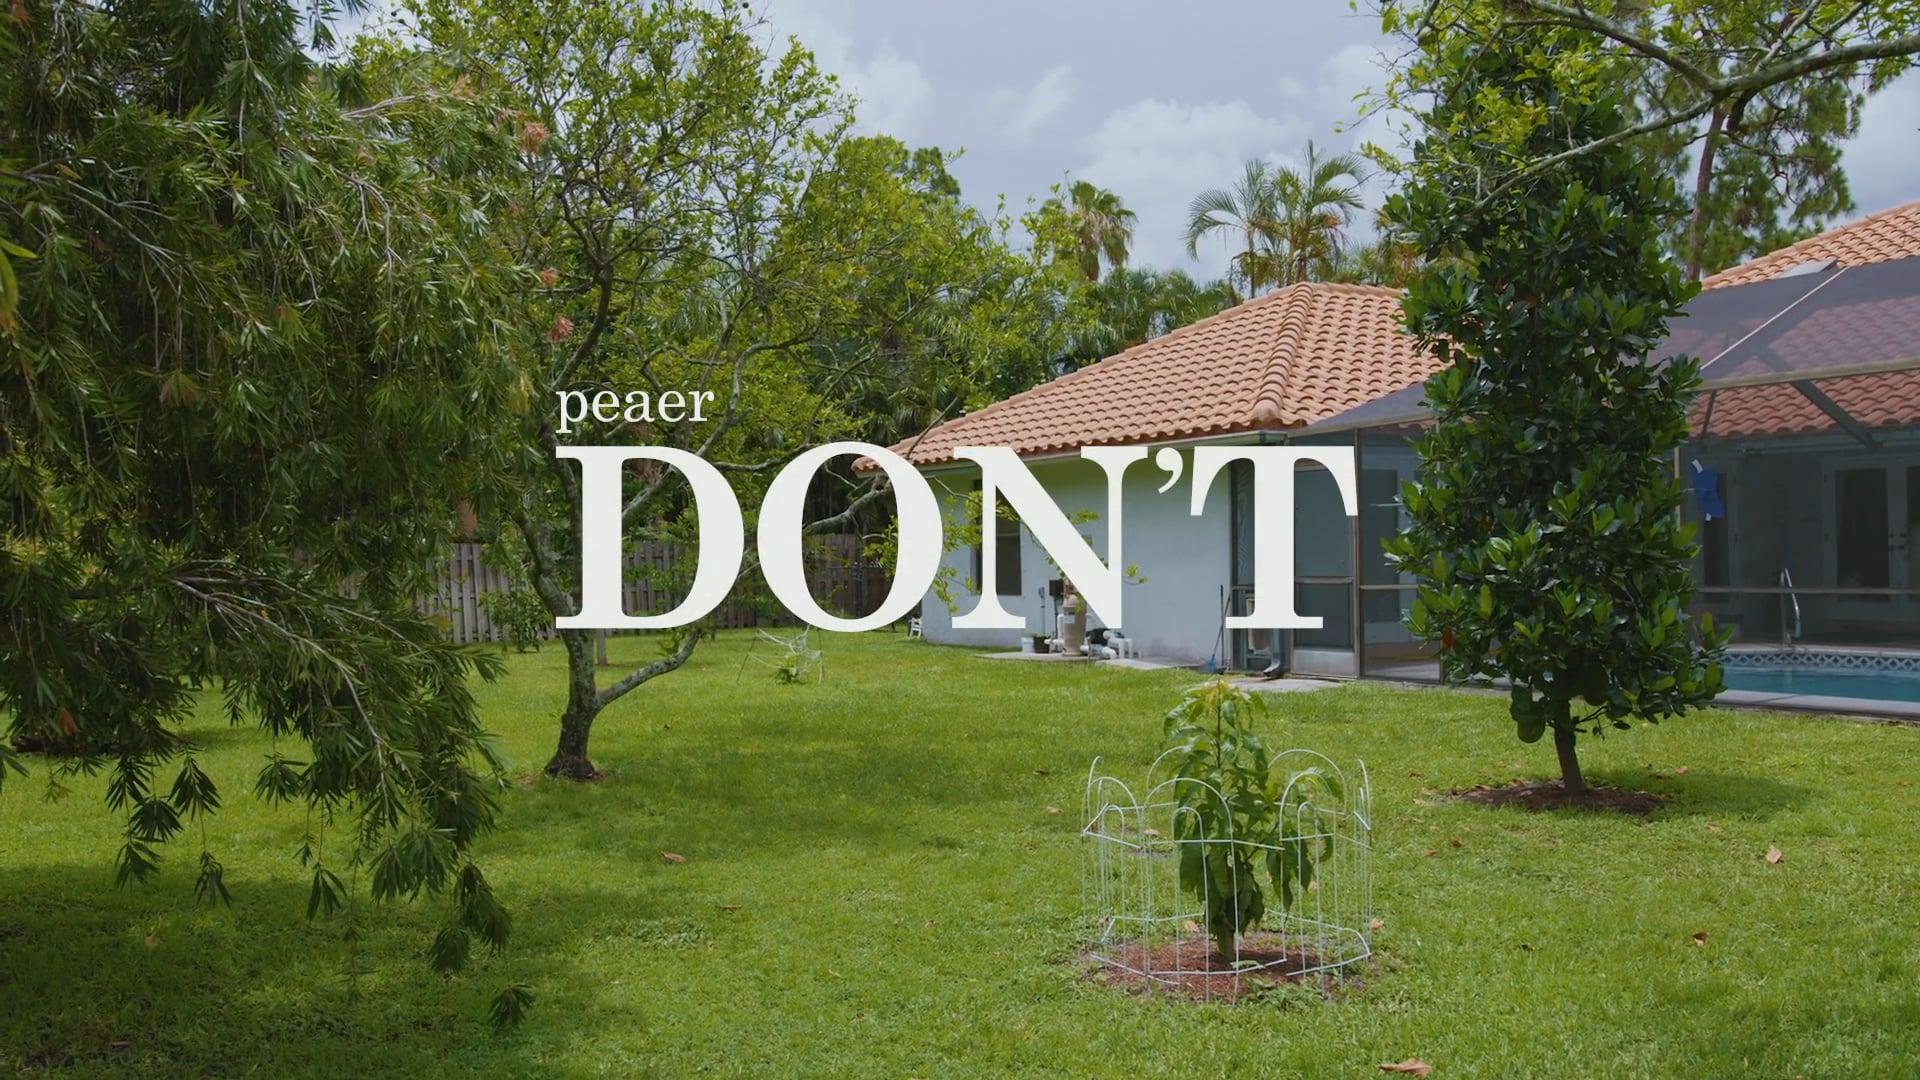 peaer - Don't